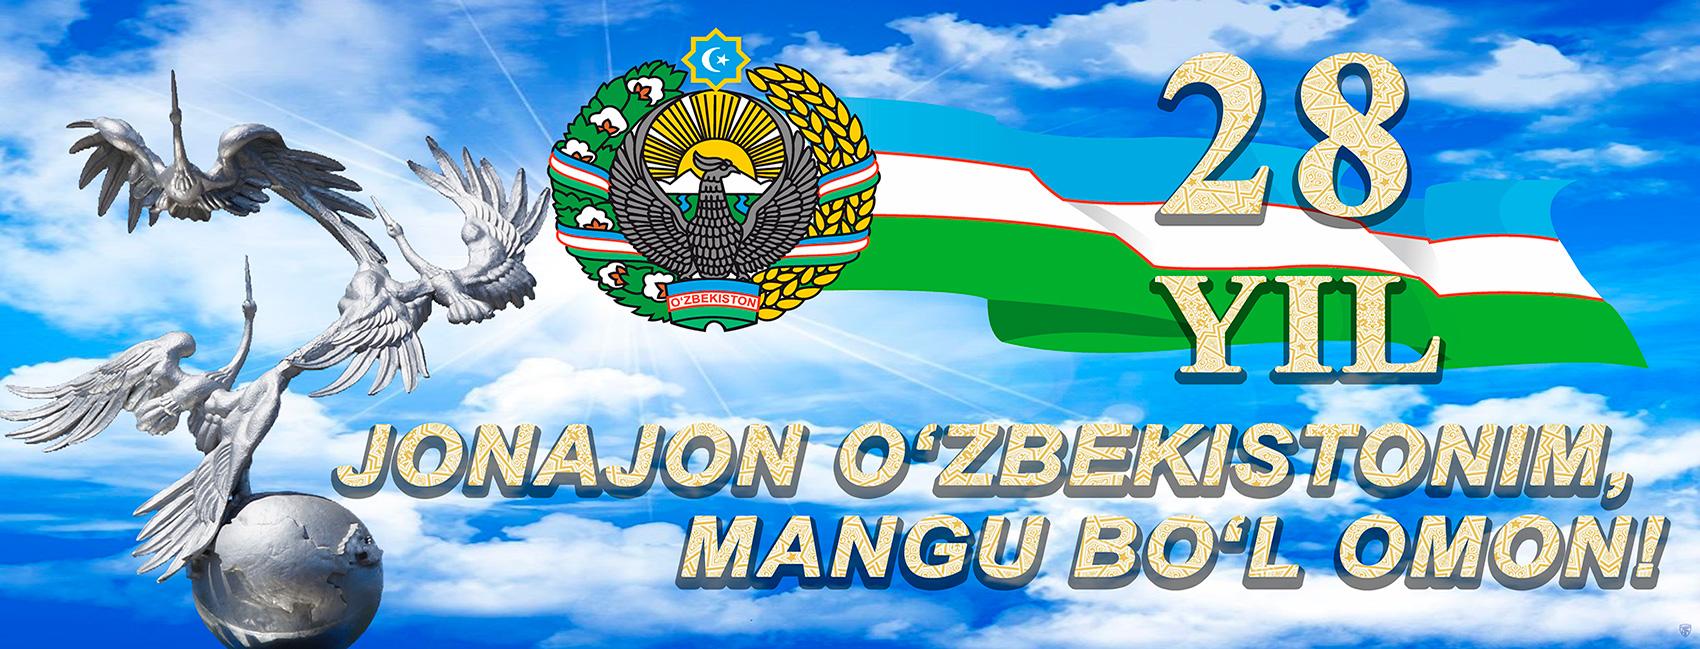 JONAJON O'ZBEKISTONIM MANGU BO'L OMON!